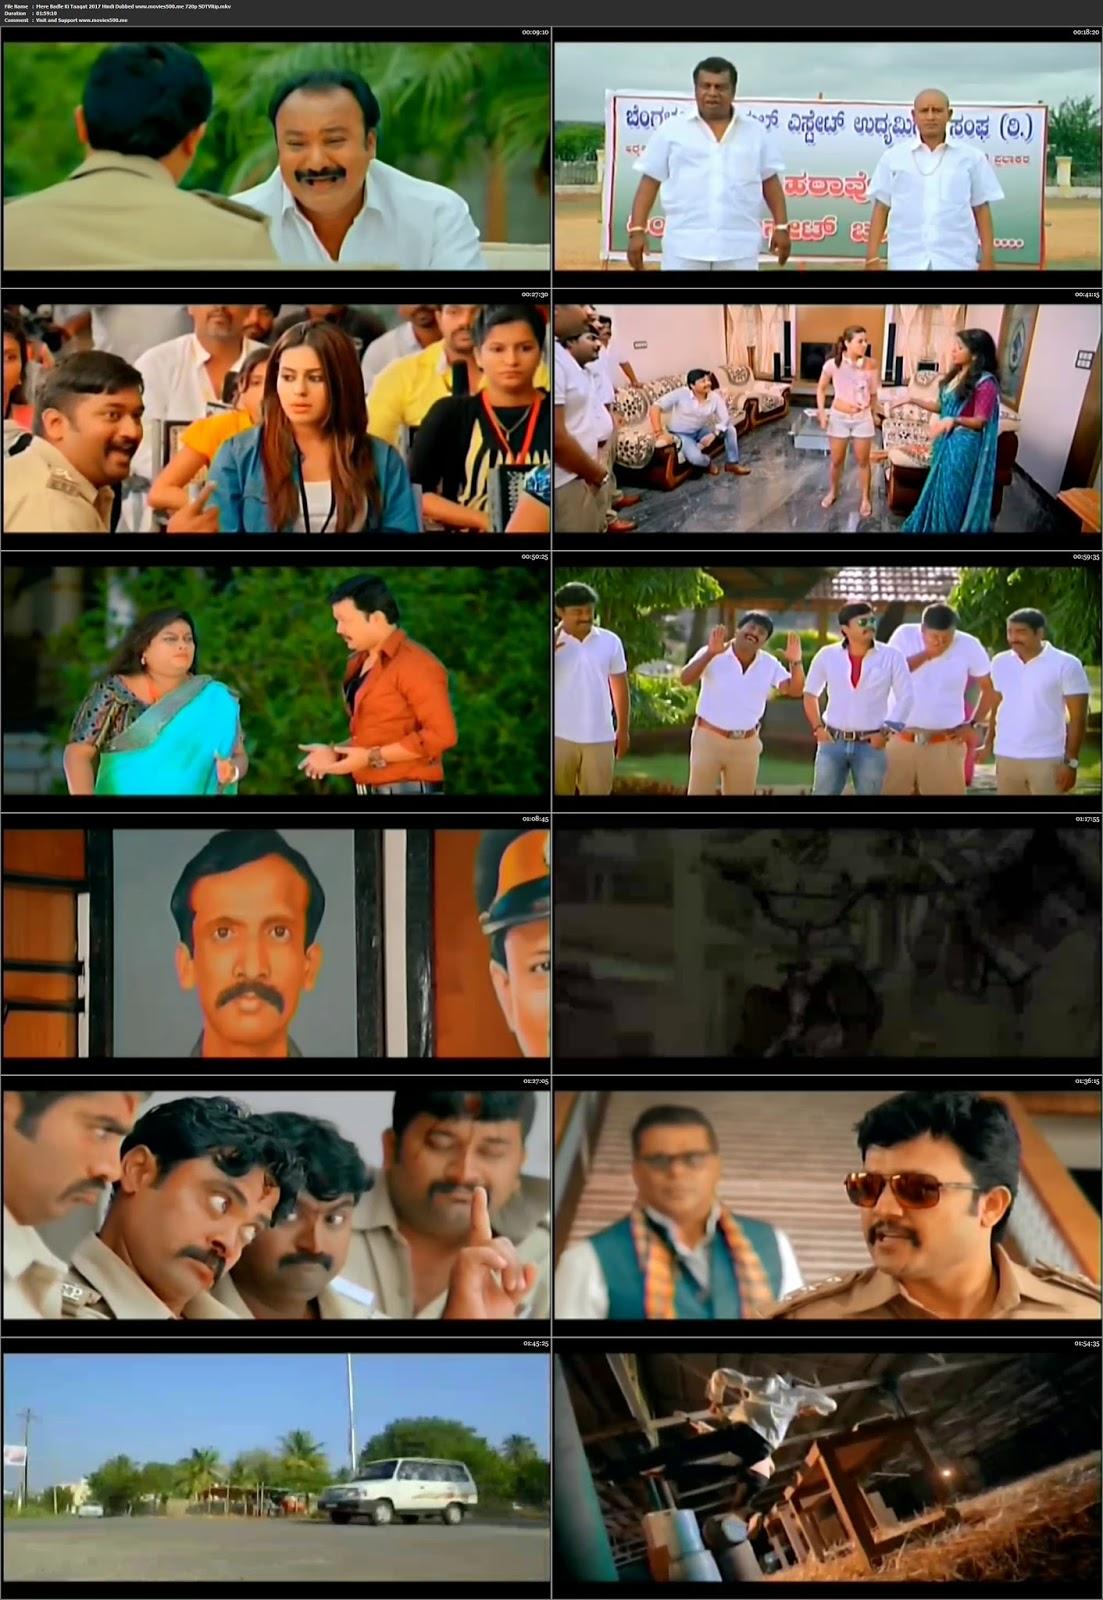 Mere Badle Ki Taaqat 2017 Hindi Dubbed Full Movie SDTVRip 720p at freedomcopy.com